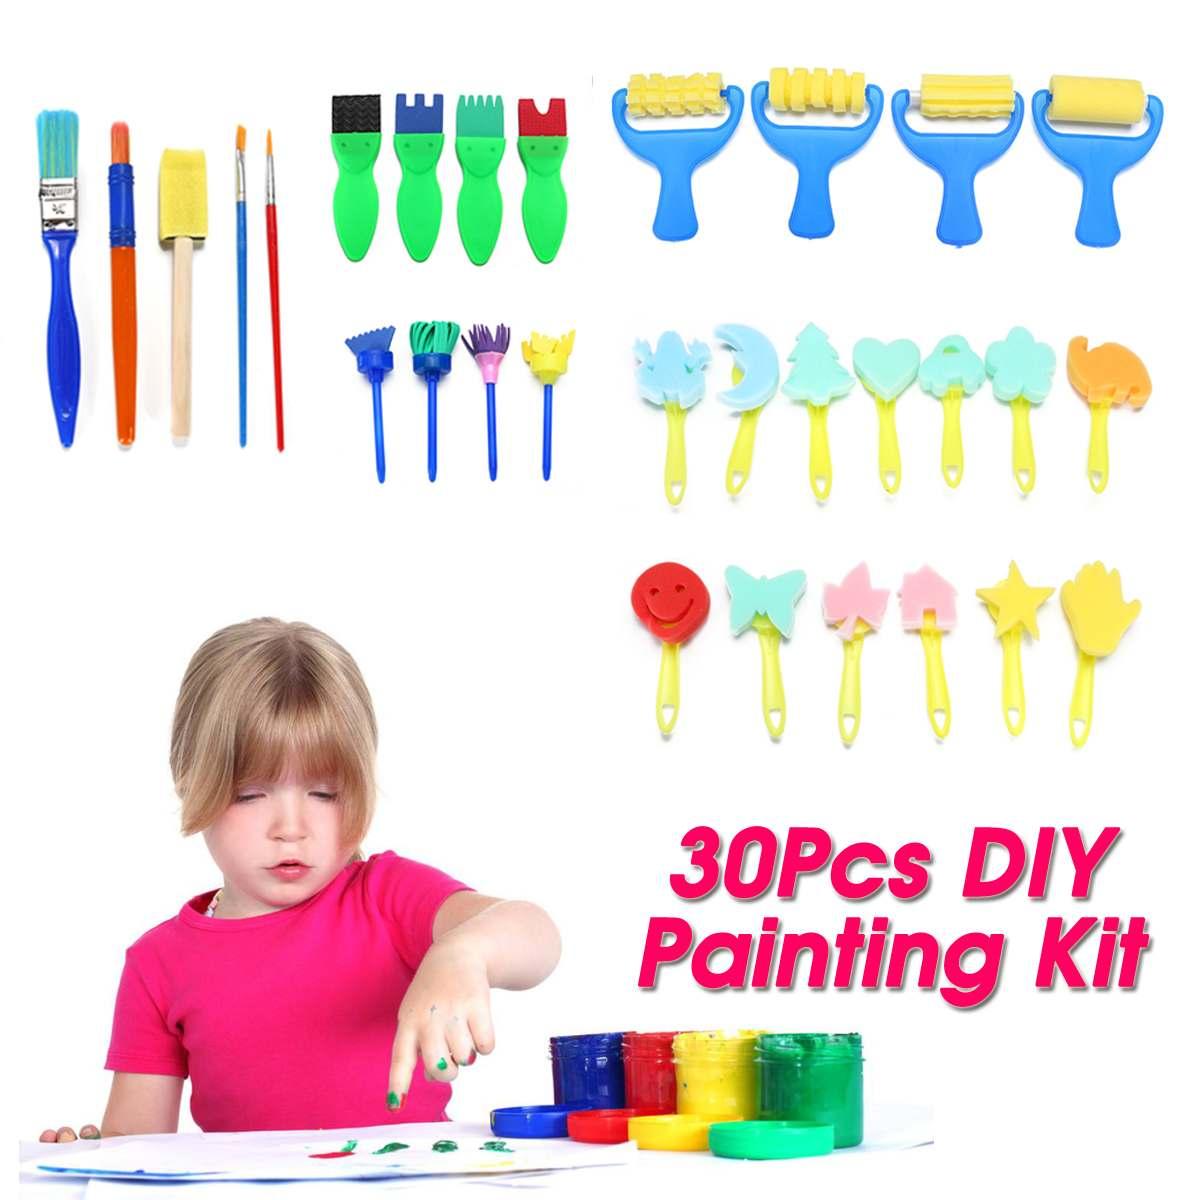 30pcs/set Diy Child Painting Tool Kit Roller Mold Sponge Drawing Writing Brush Mini Pattern Mold Toy Kids Gifts  Merry Christmas